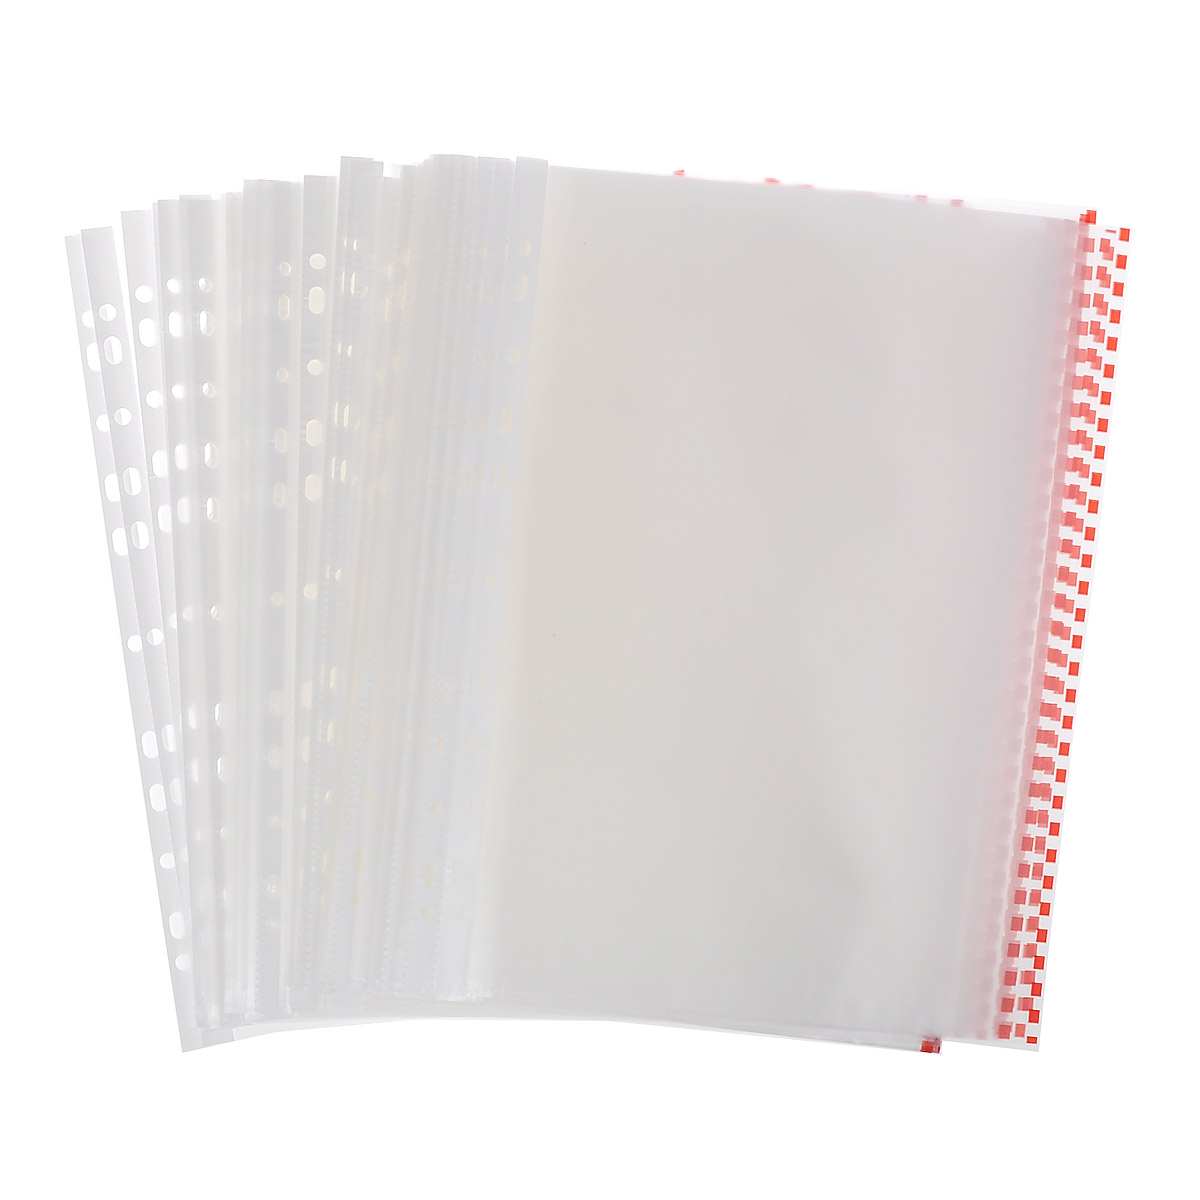 "Файл-вкладыш ""Erich Krause"", с перфорацией, цвет: прозрачный, красный, формат А4, 100 шт"